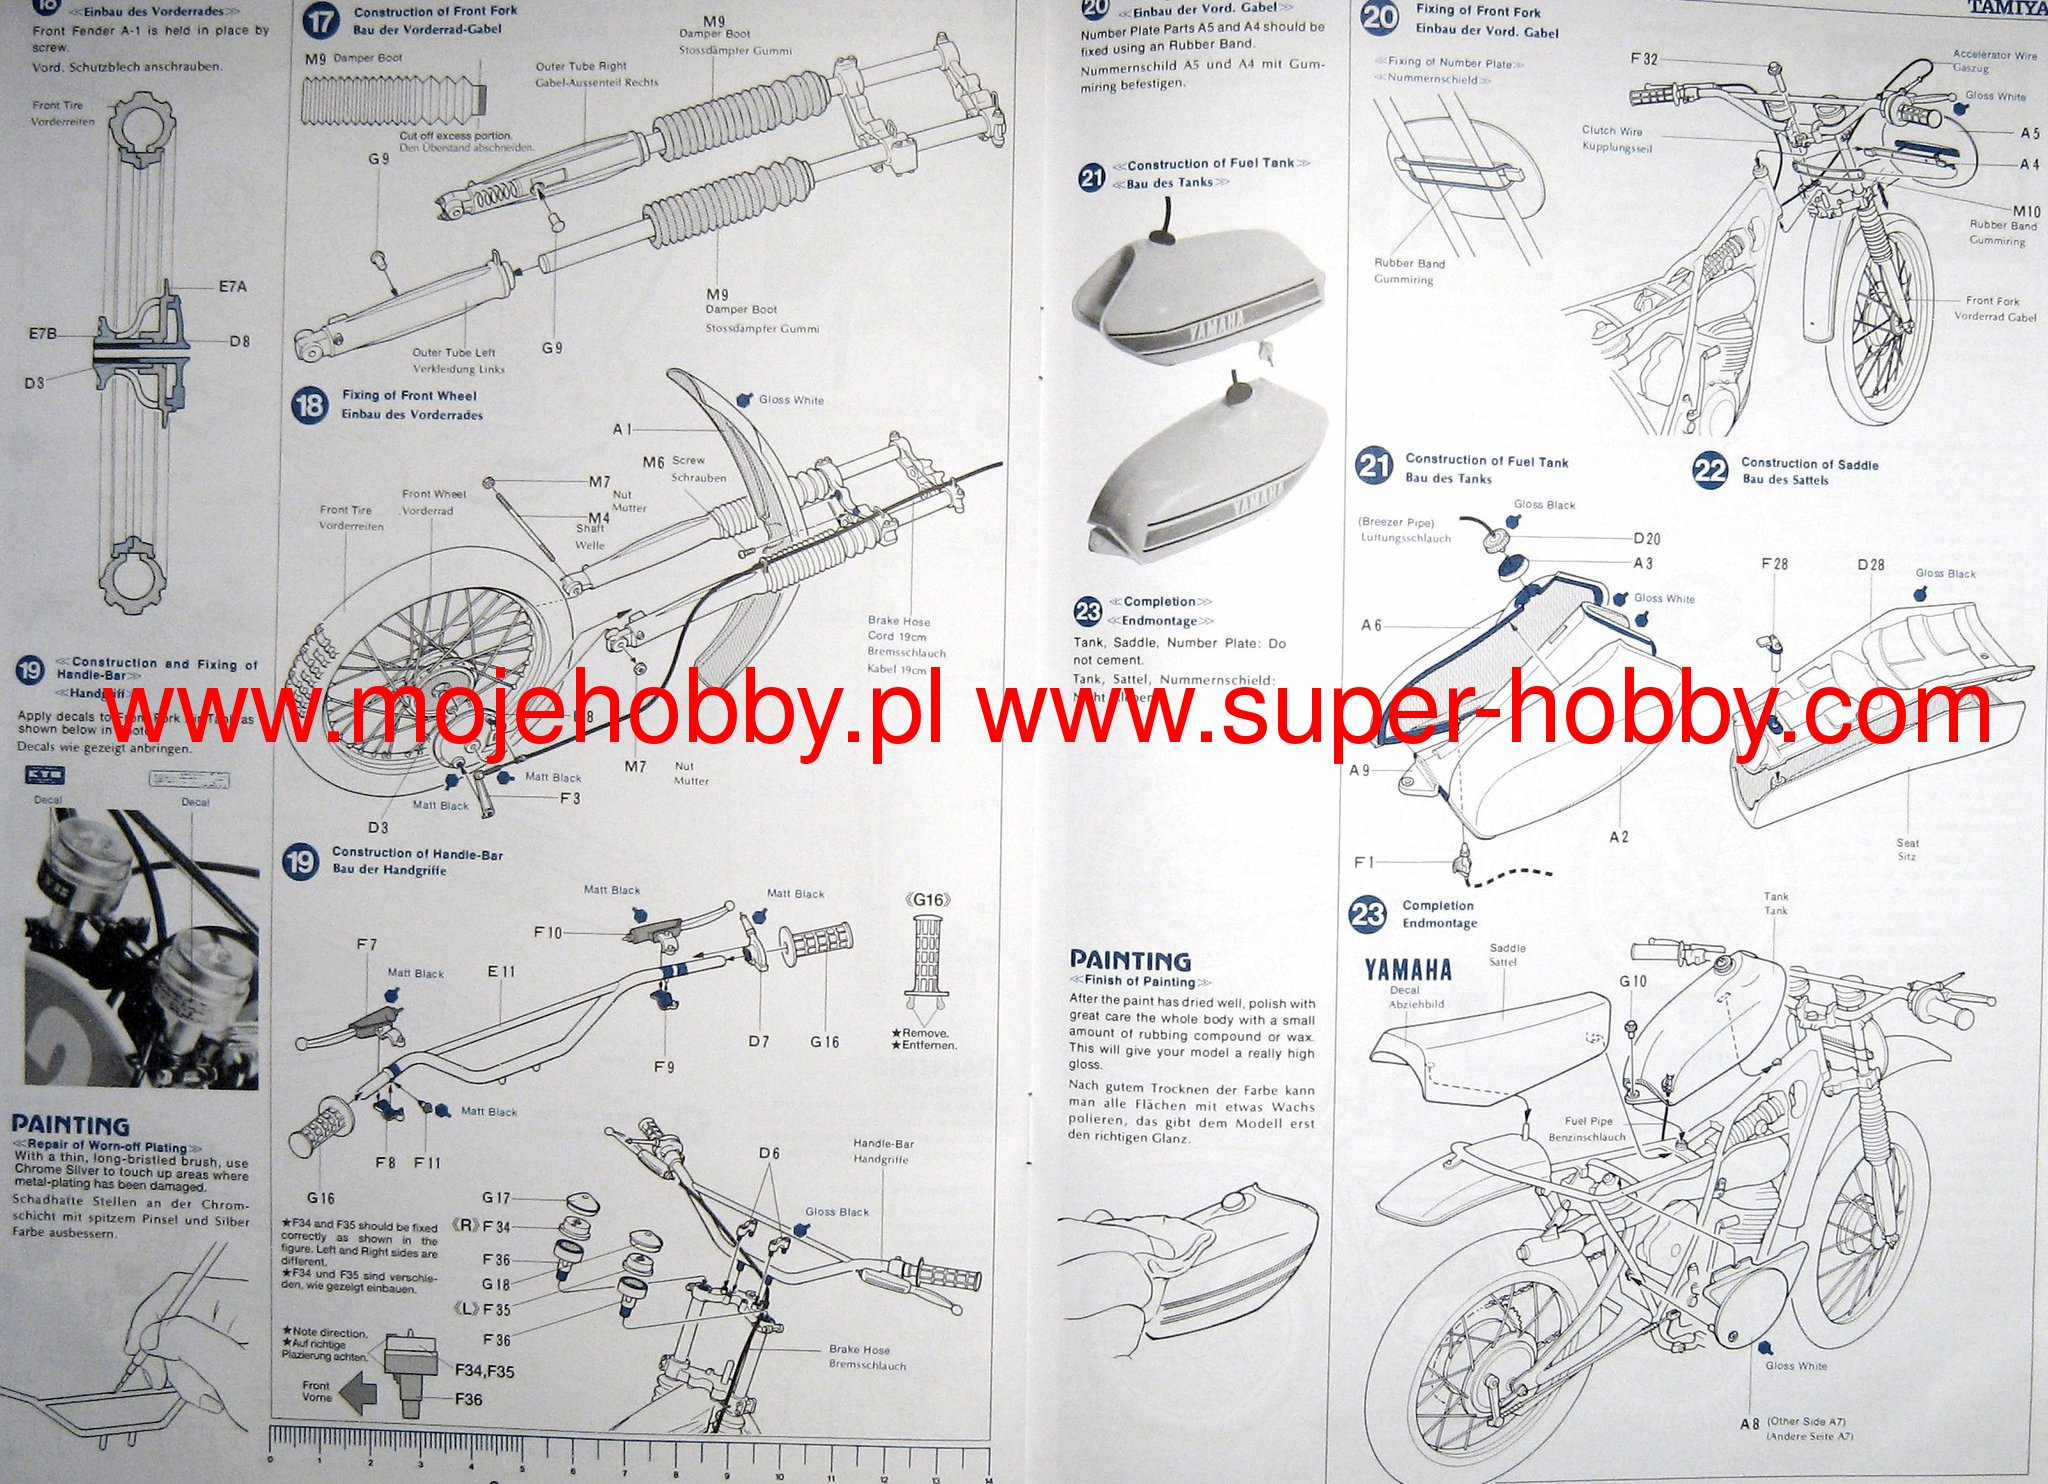 Yamaha Motocrosser Yz250 Tamiya 16036 Wiring Diagram 2 Tam16036 5